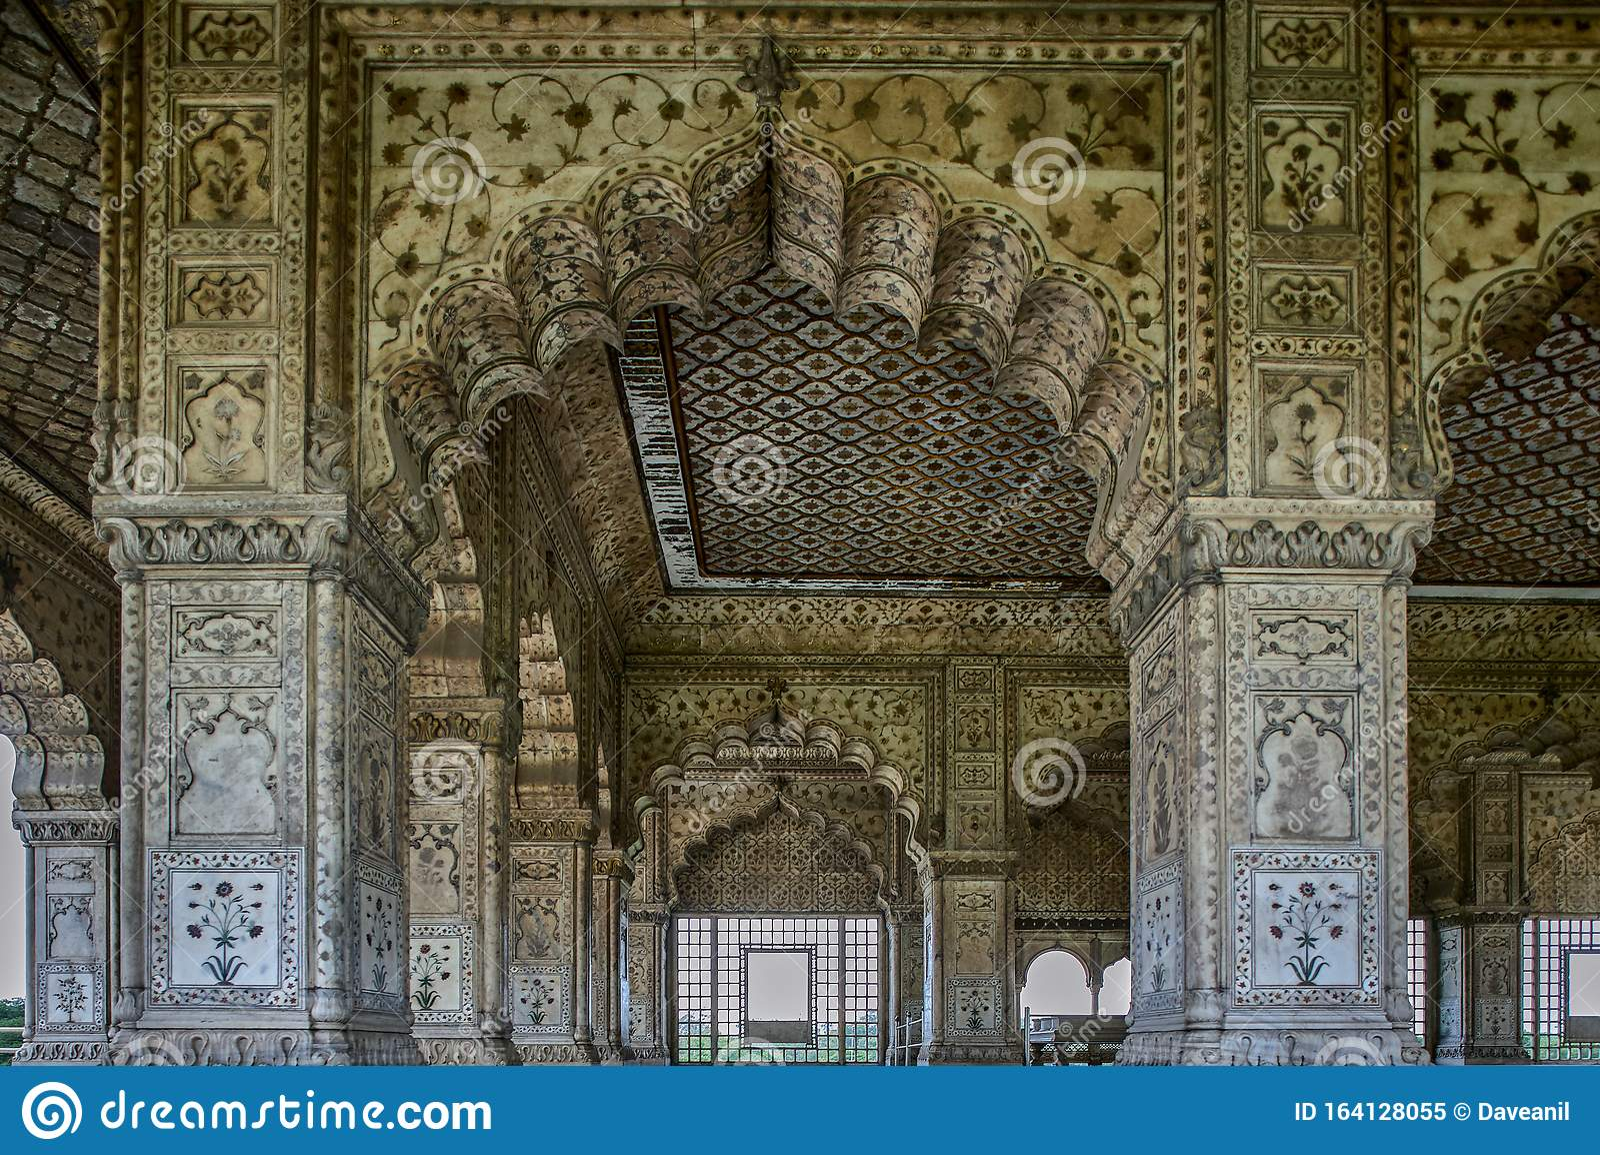 India - Delhi - 030 - Red Fort - Diwan-i-Khas | The white